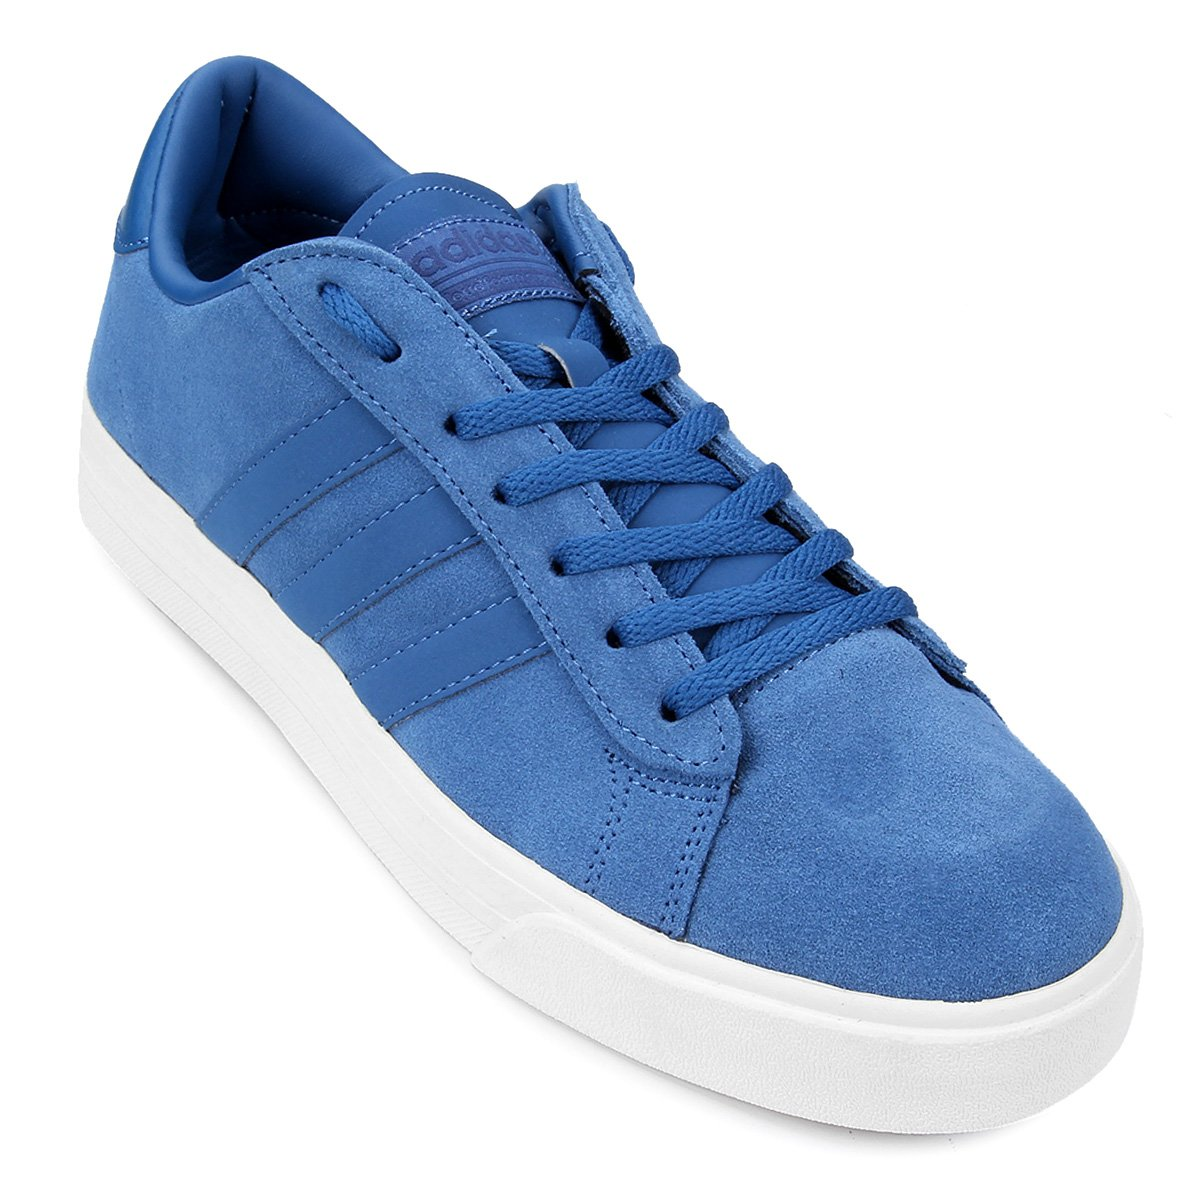 Tênis Adidas Cloudfoam Super Daily Masculino - Azul - Compre Agora ... fa9ad859d0aff